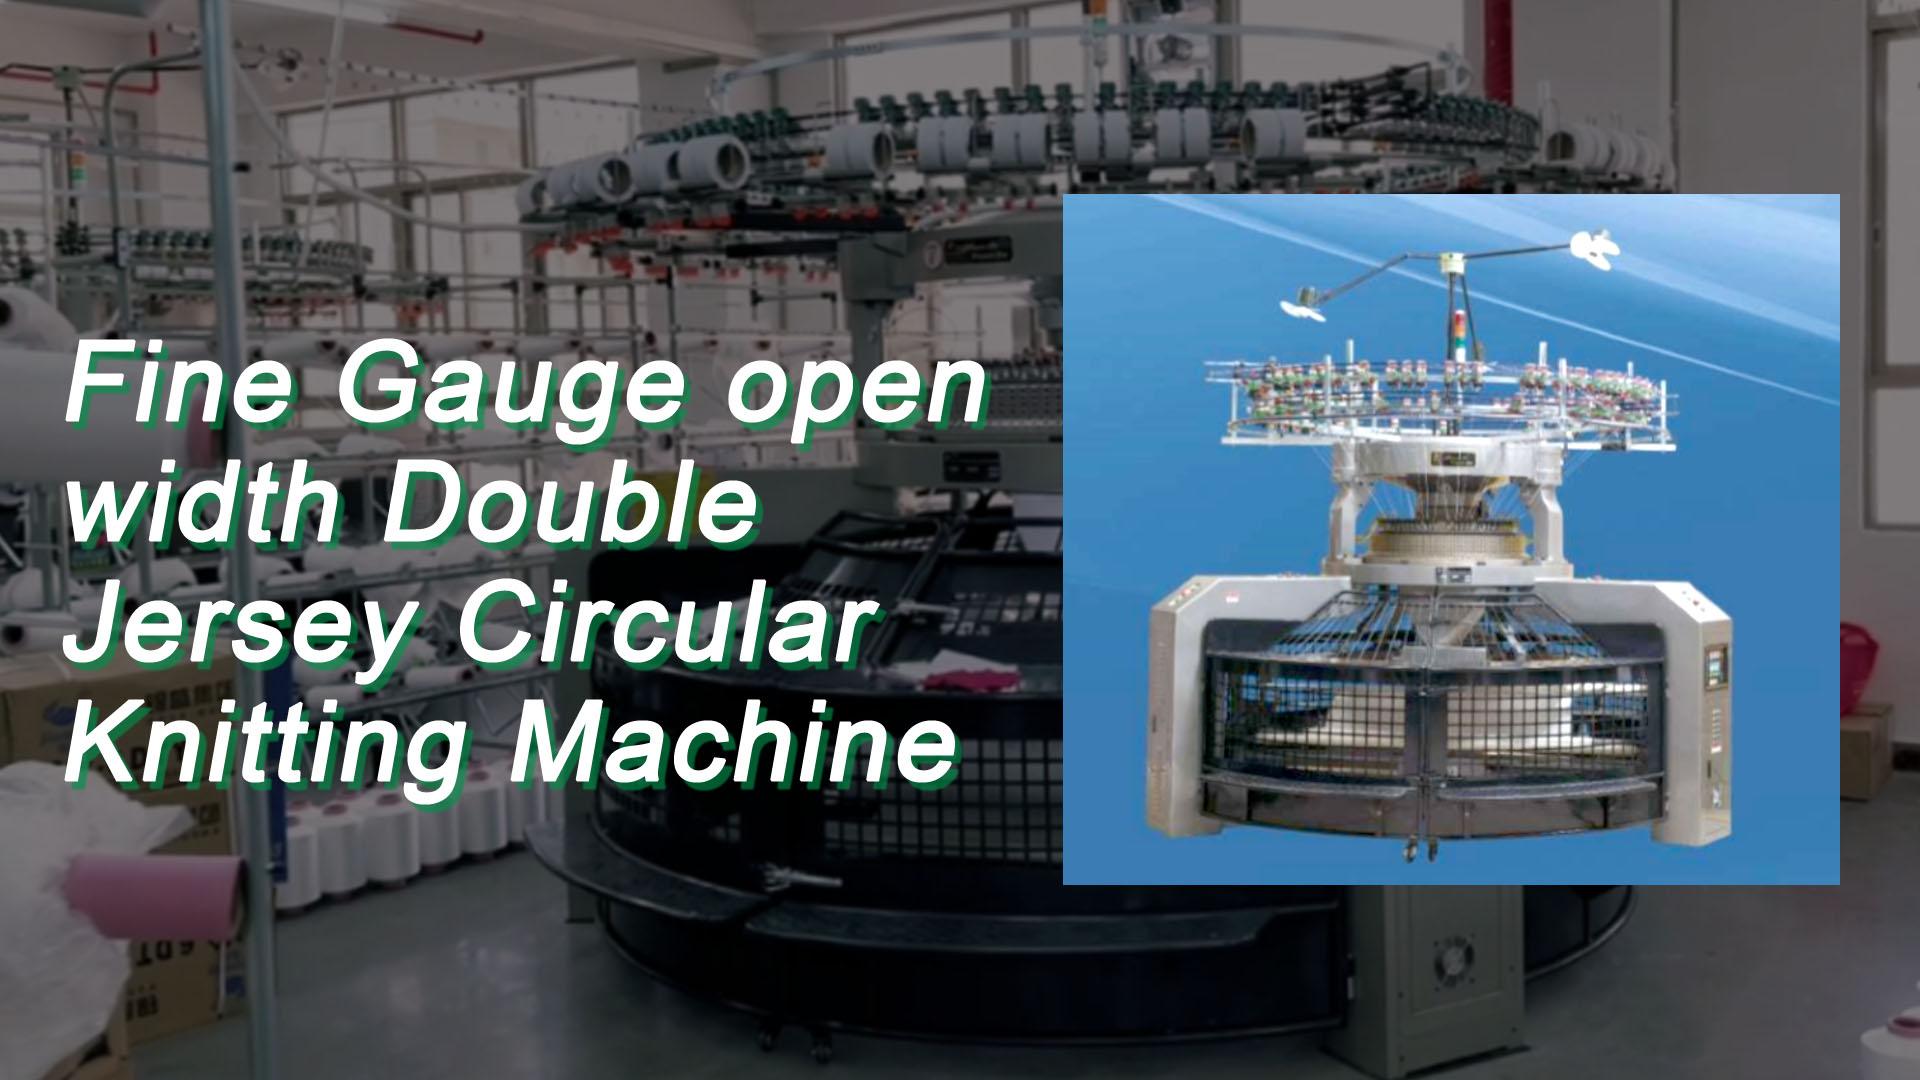 Fine Gauge open width Double Jersey Circular Knitting Machine